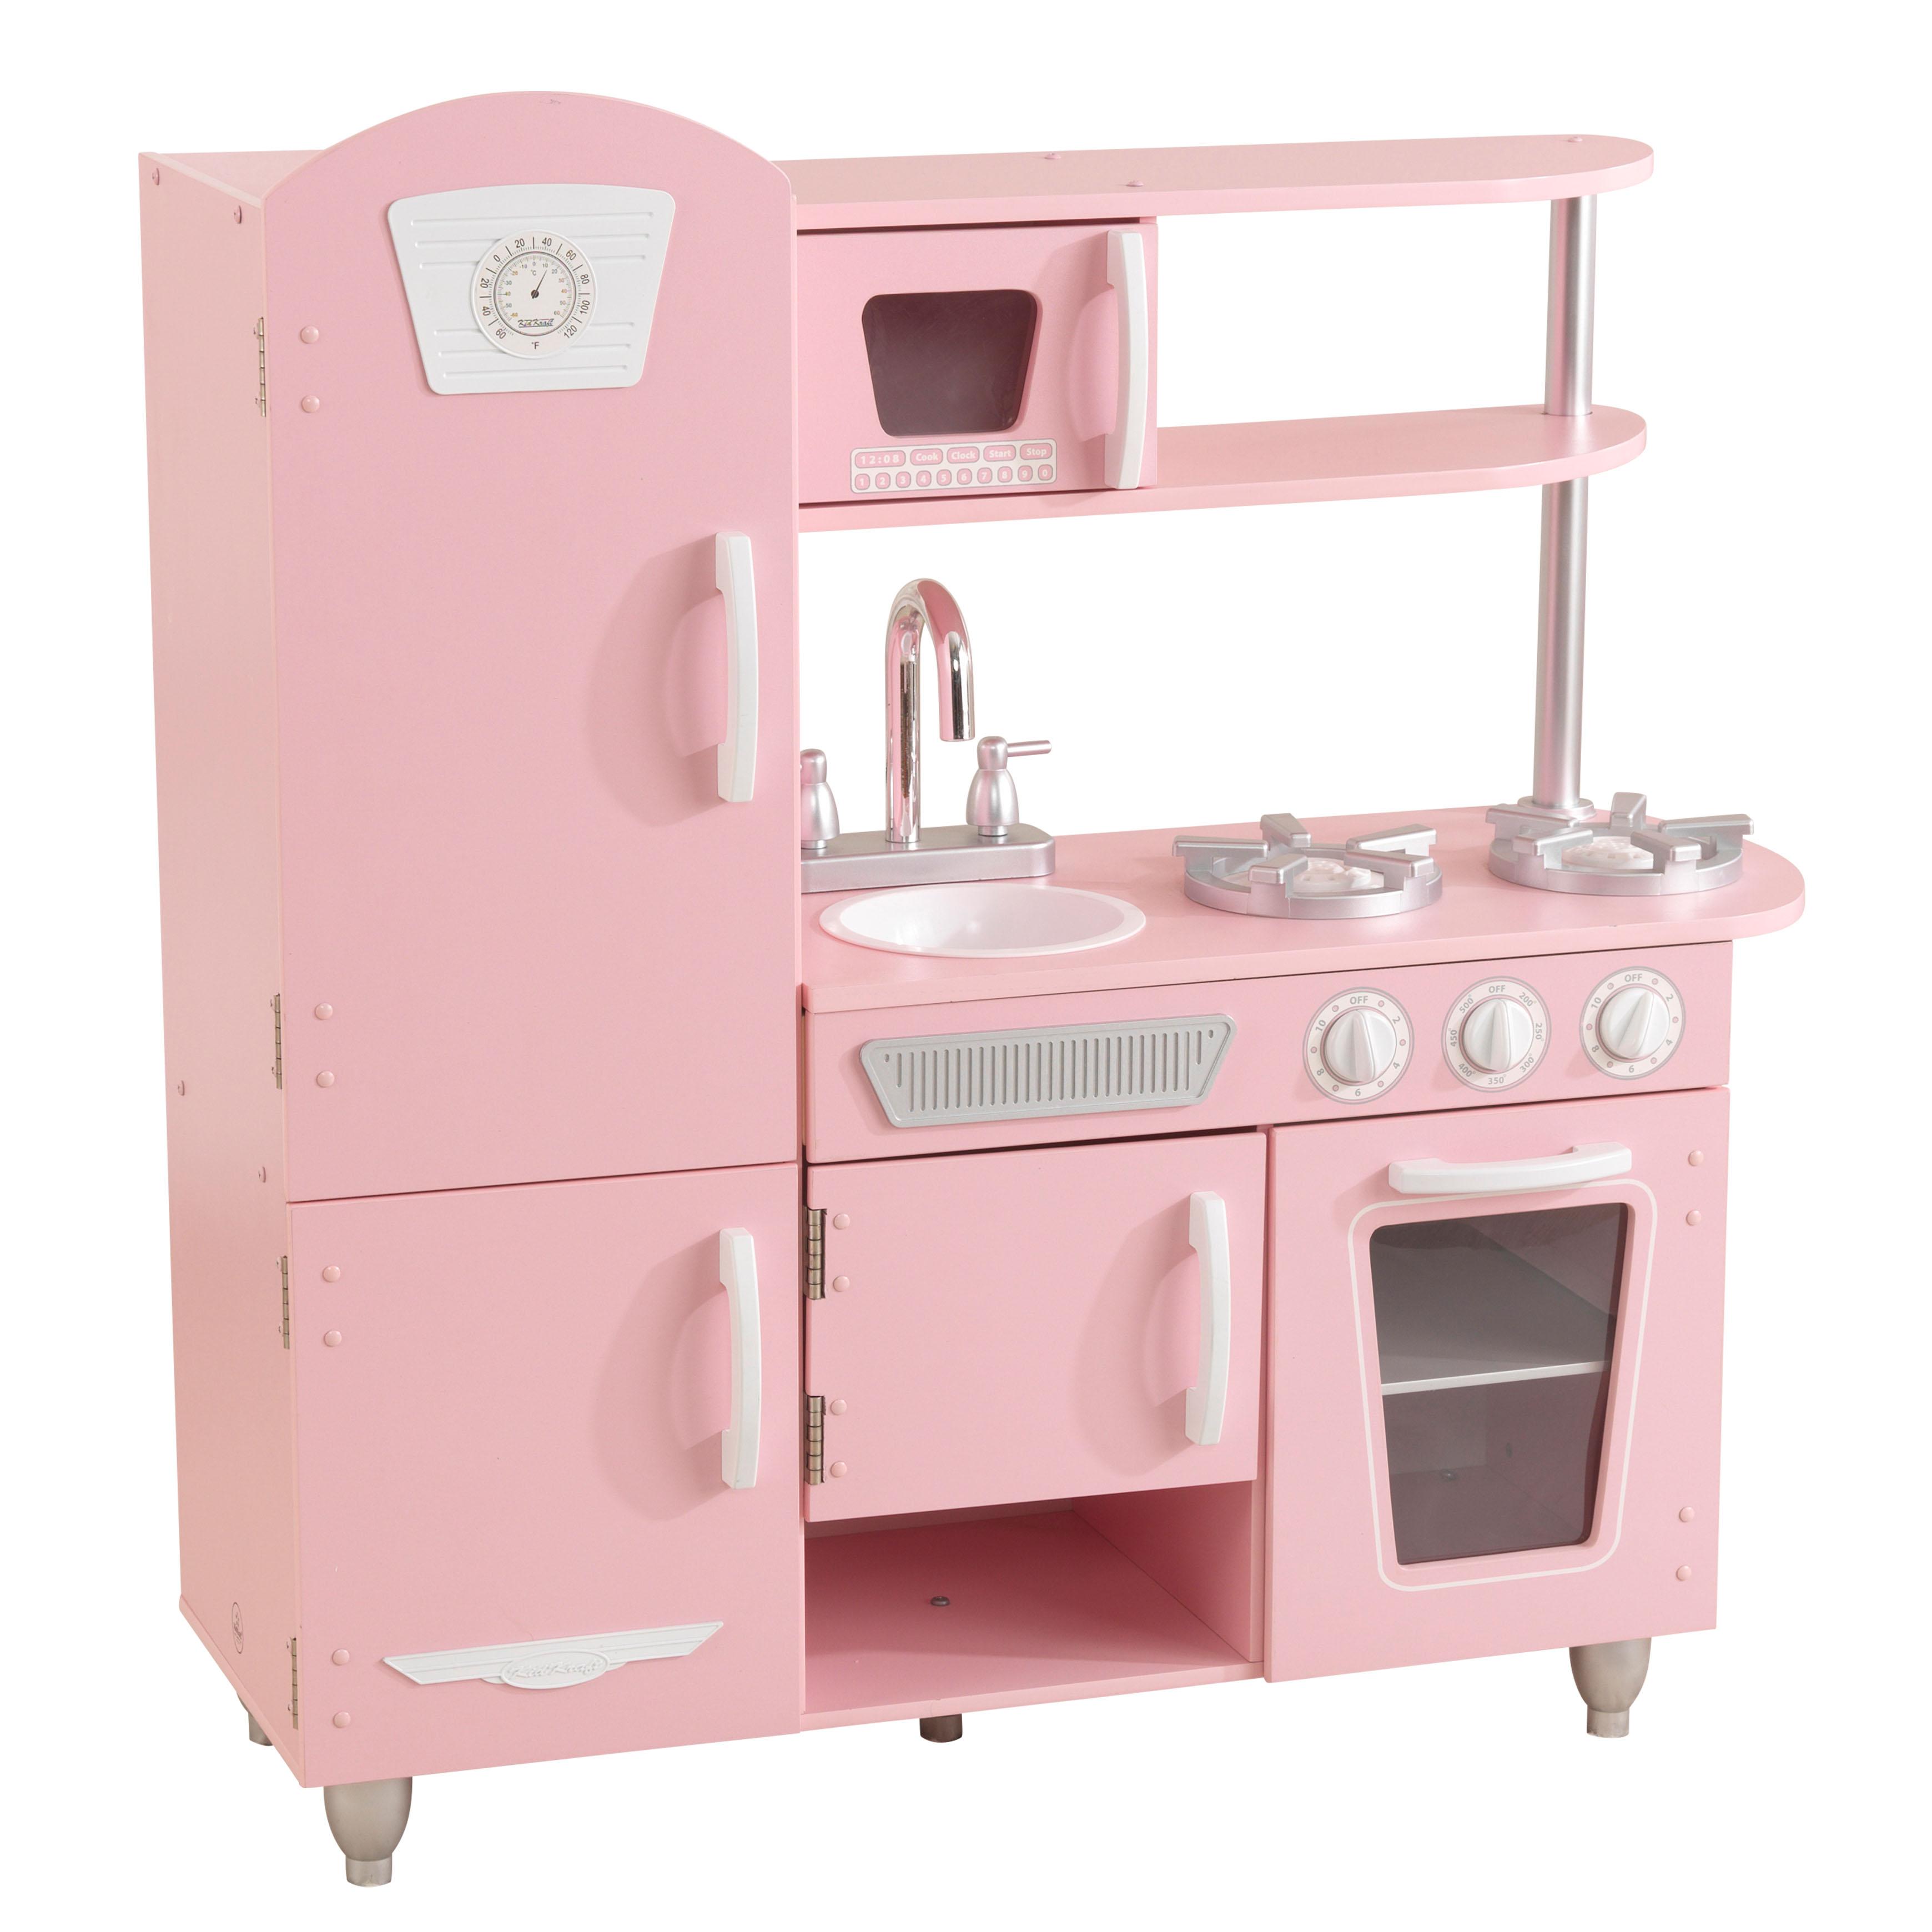 KidKraft Wooden Vintage Play Kitchen (pink) $89 + Free Shipping